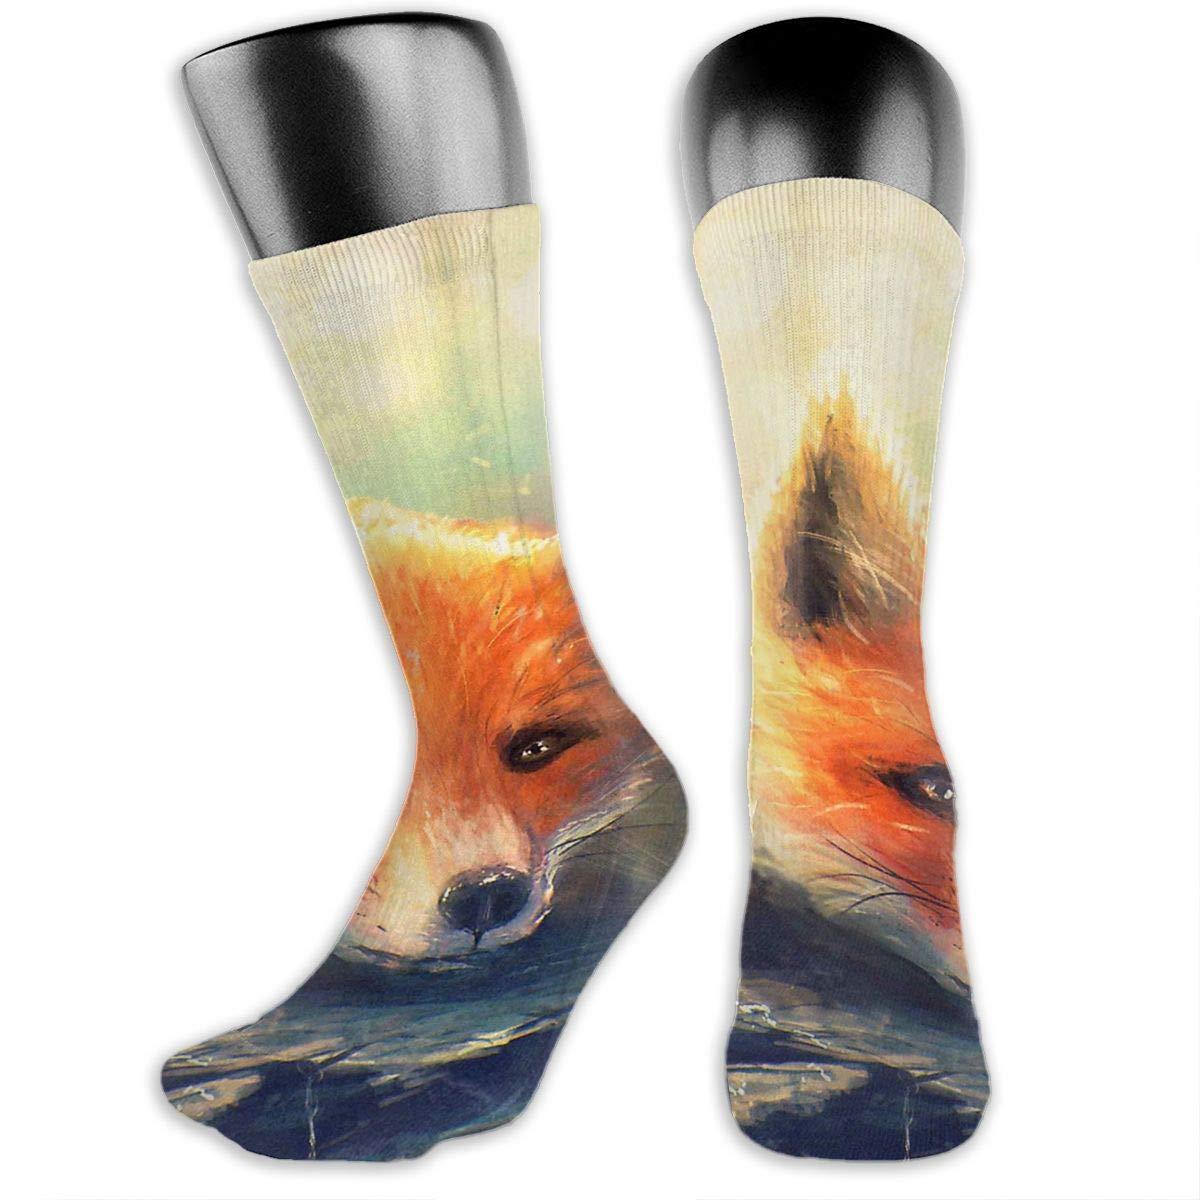 OLGCZM Cute Fox Men Womens Thin High Ankle Casual Socks Fit Outdoor Hiking Trail